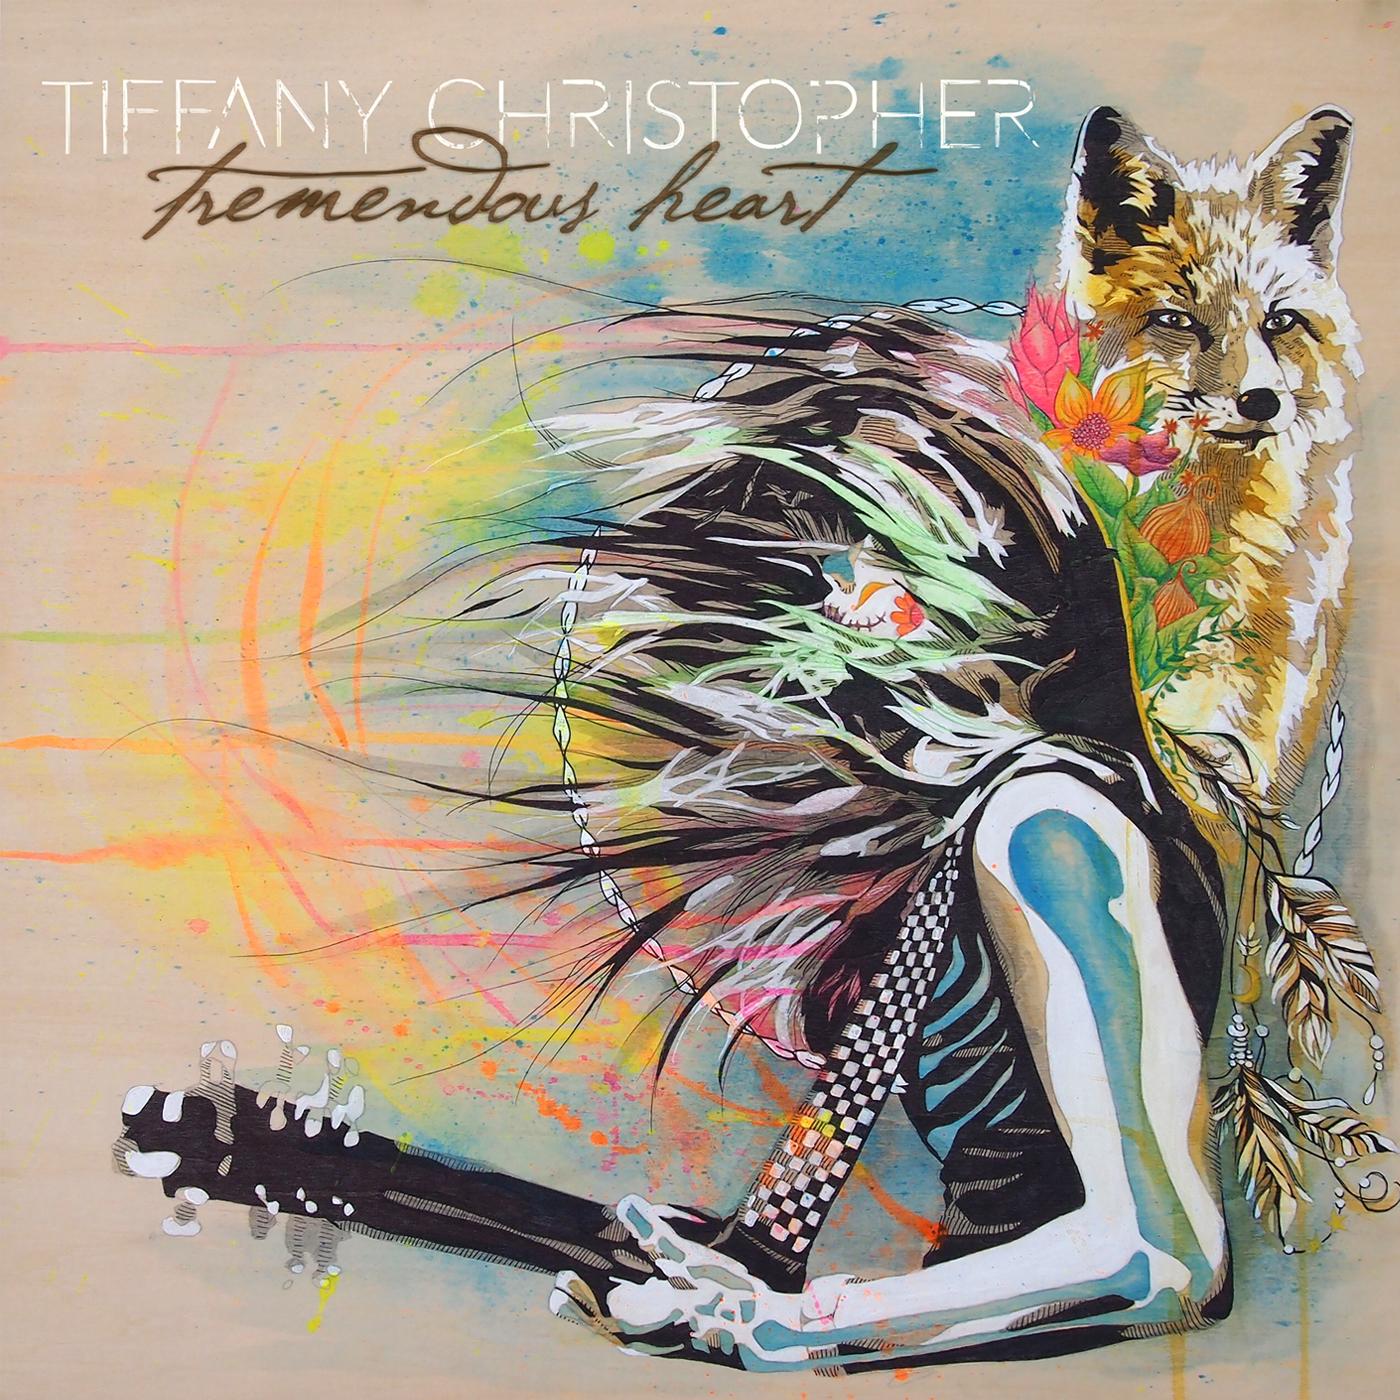 Tiffany-Christopher-Tremendous-Heart-1400x1400.jpg